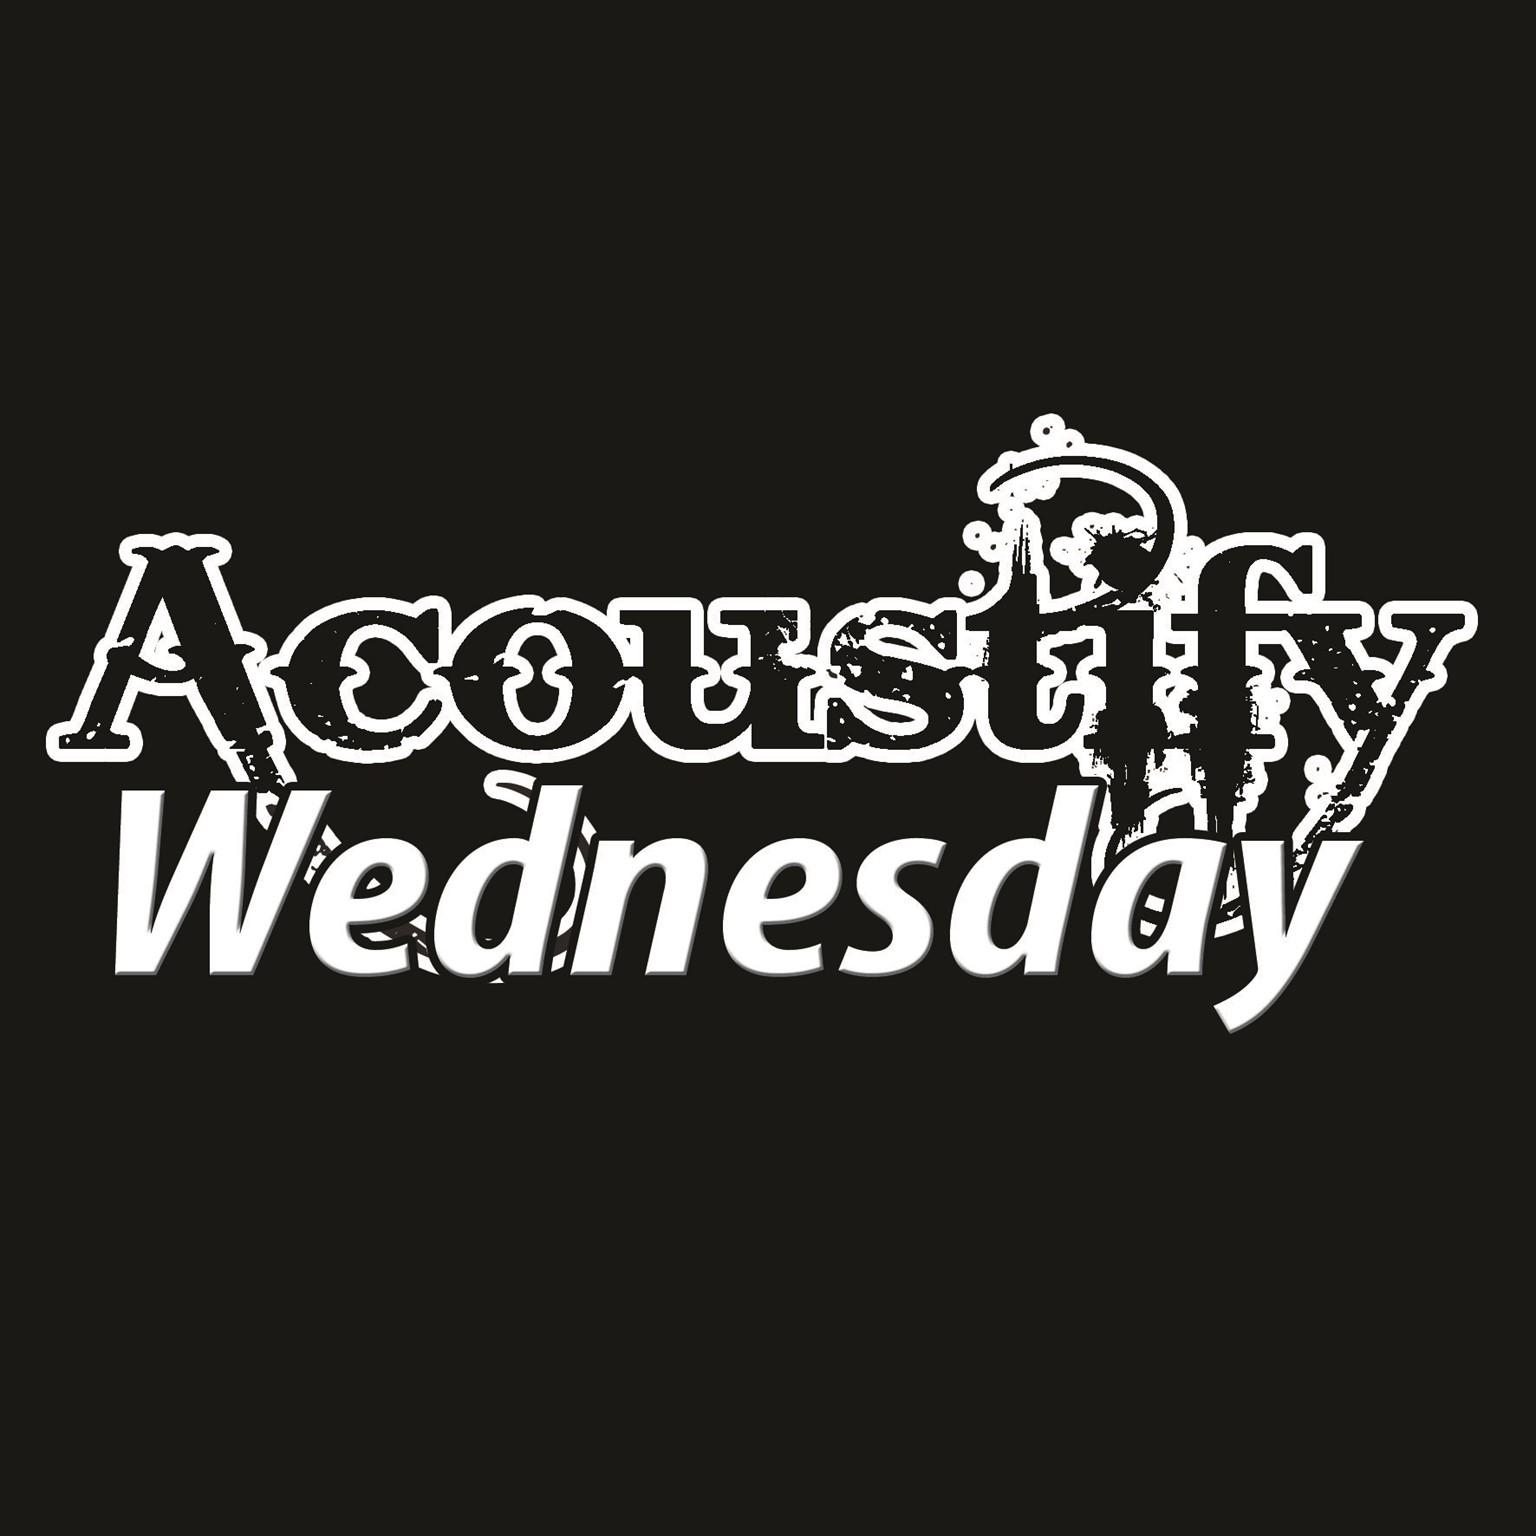 Acoustify